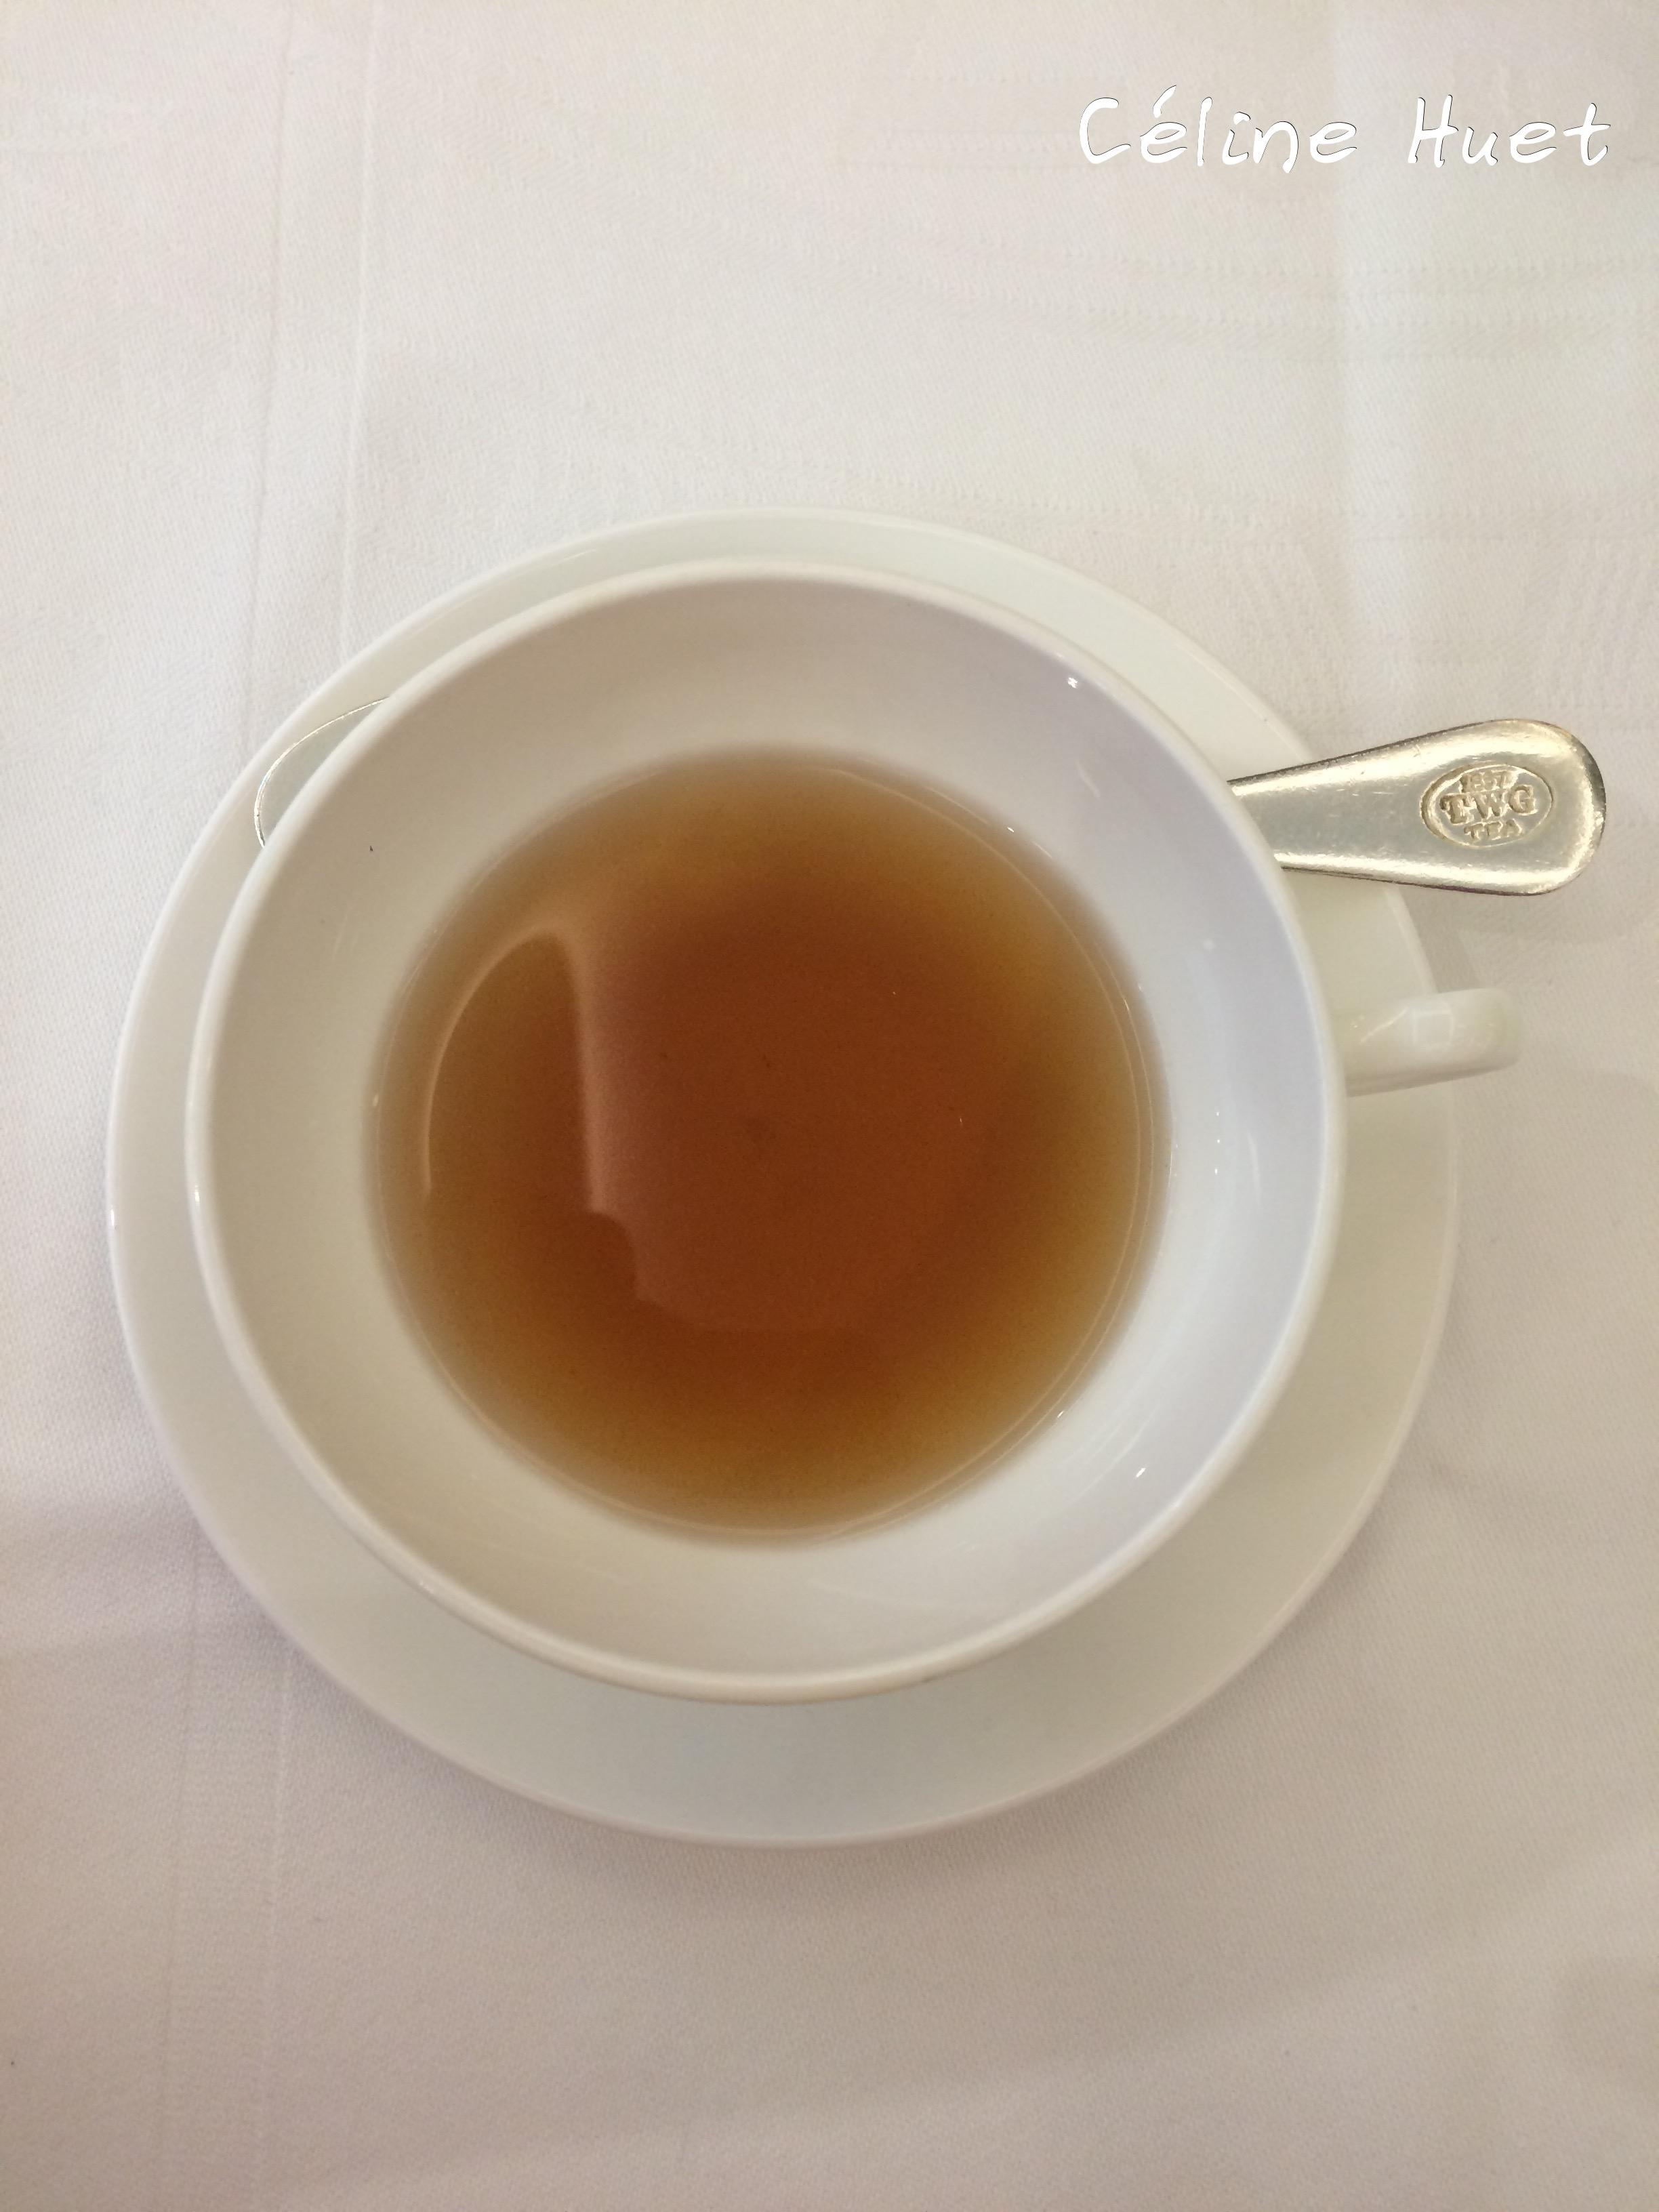 Timeless TWG Tea Siam Paragon Bangkok Thaïlande Asie